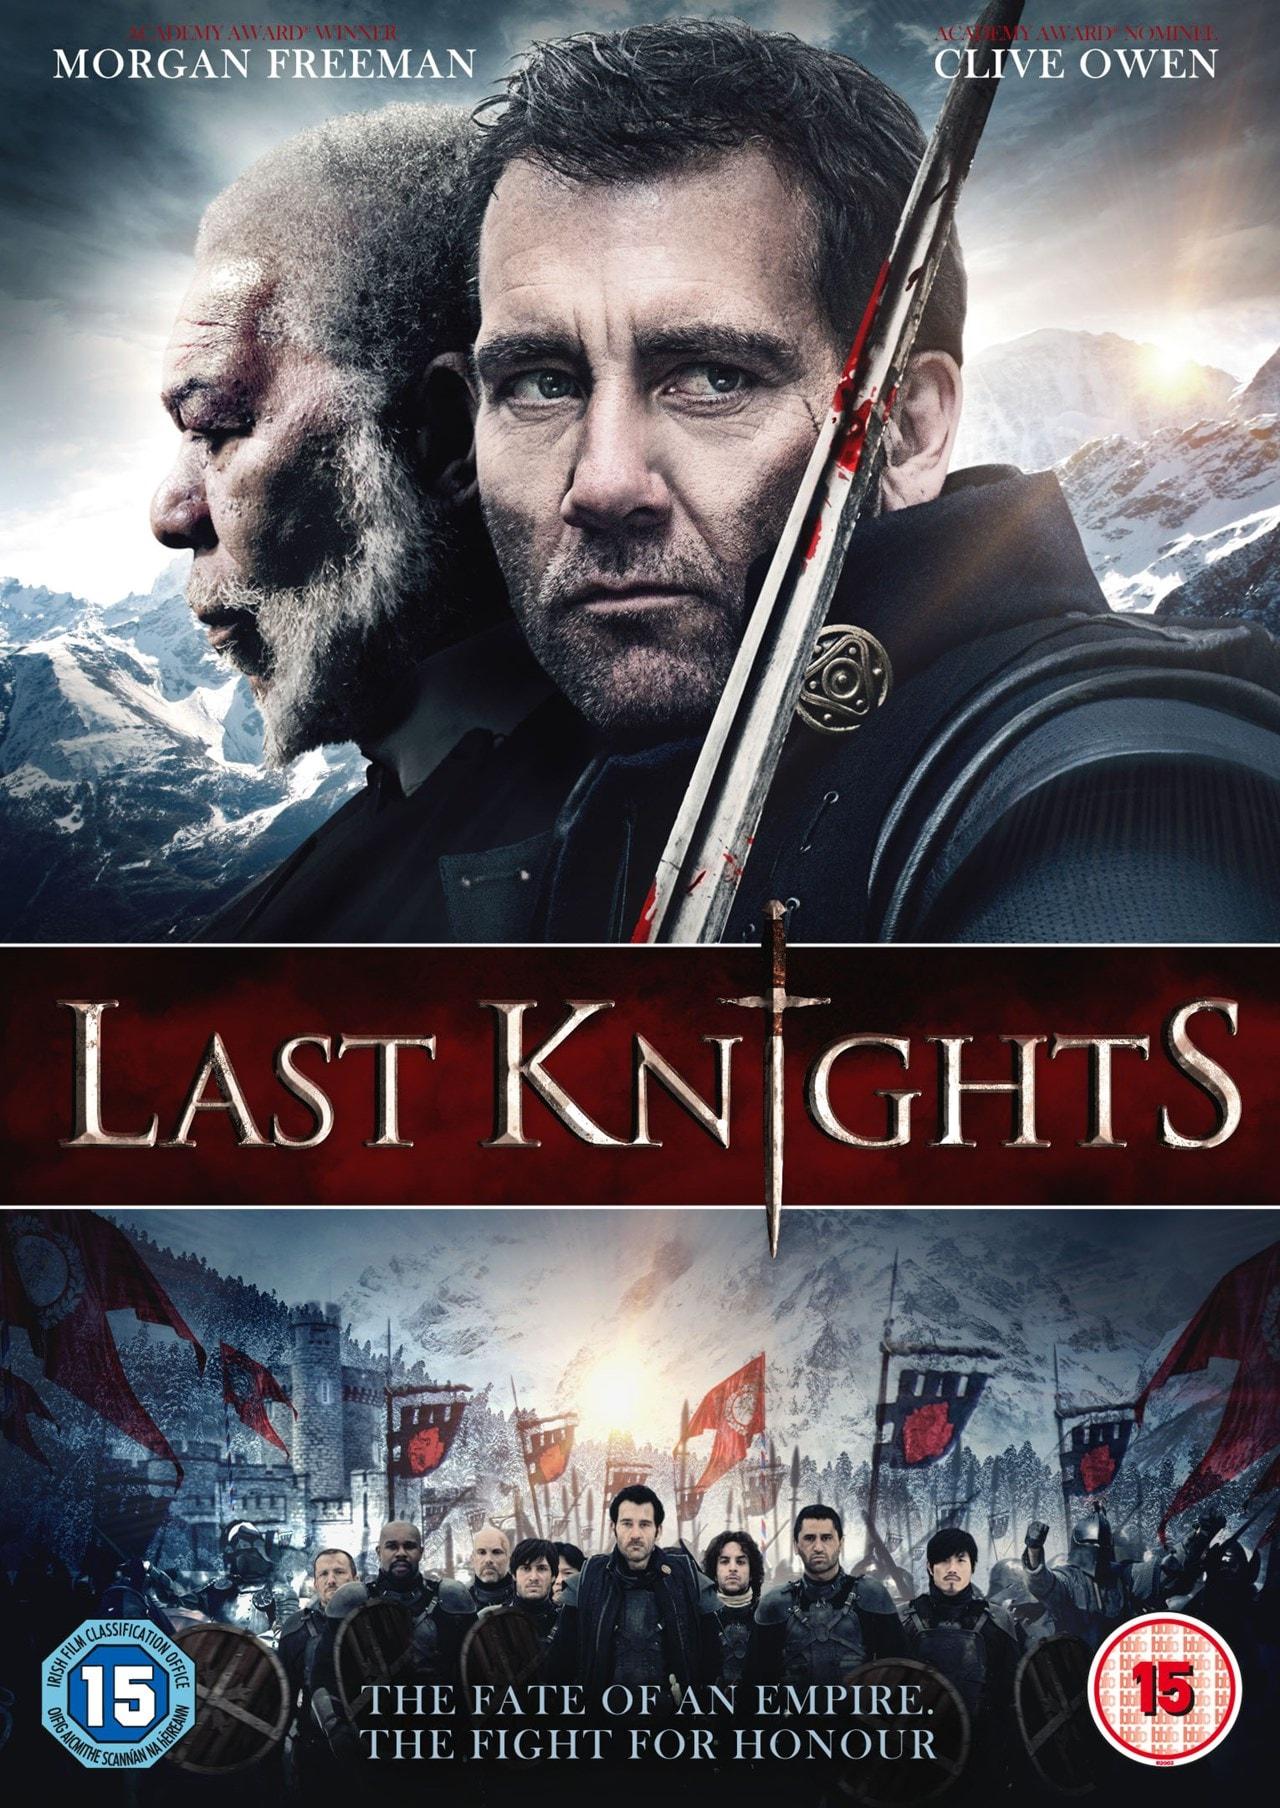 The Last Knights - 1